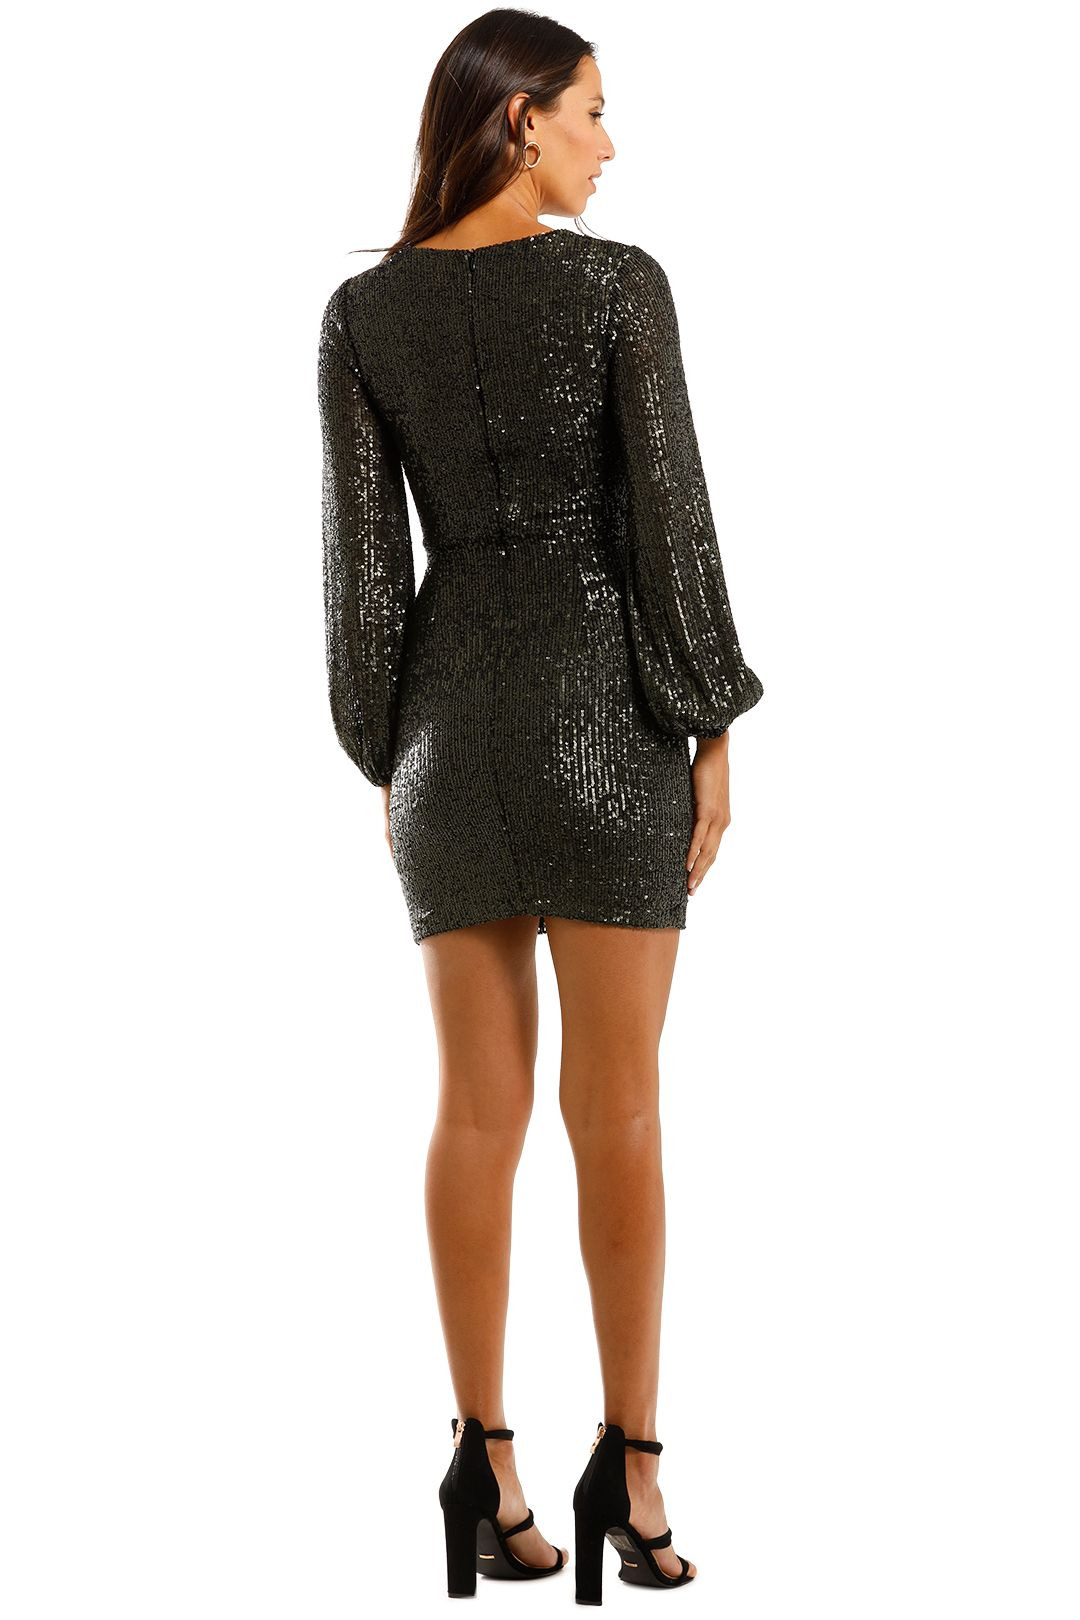 Pasduchas Spangle Dress Combat Mini Sequins Black Gold